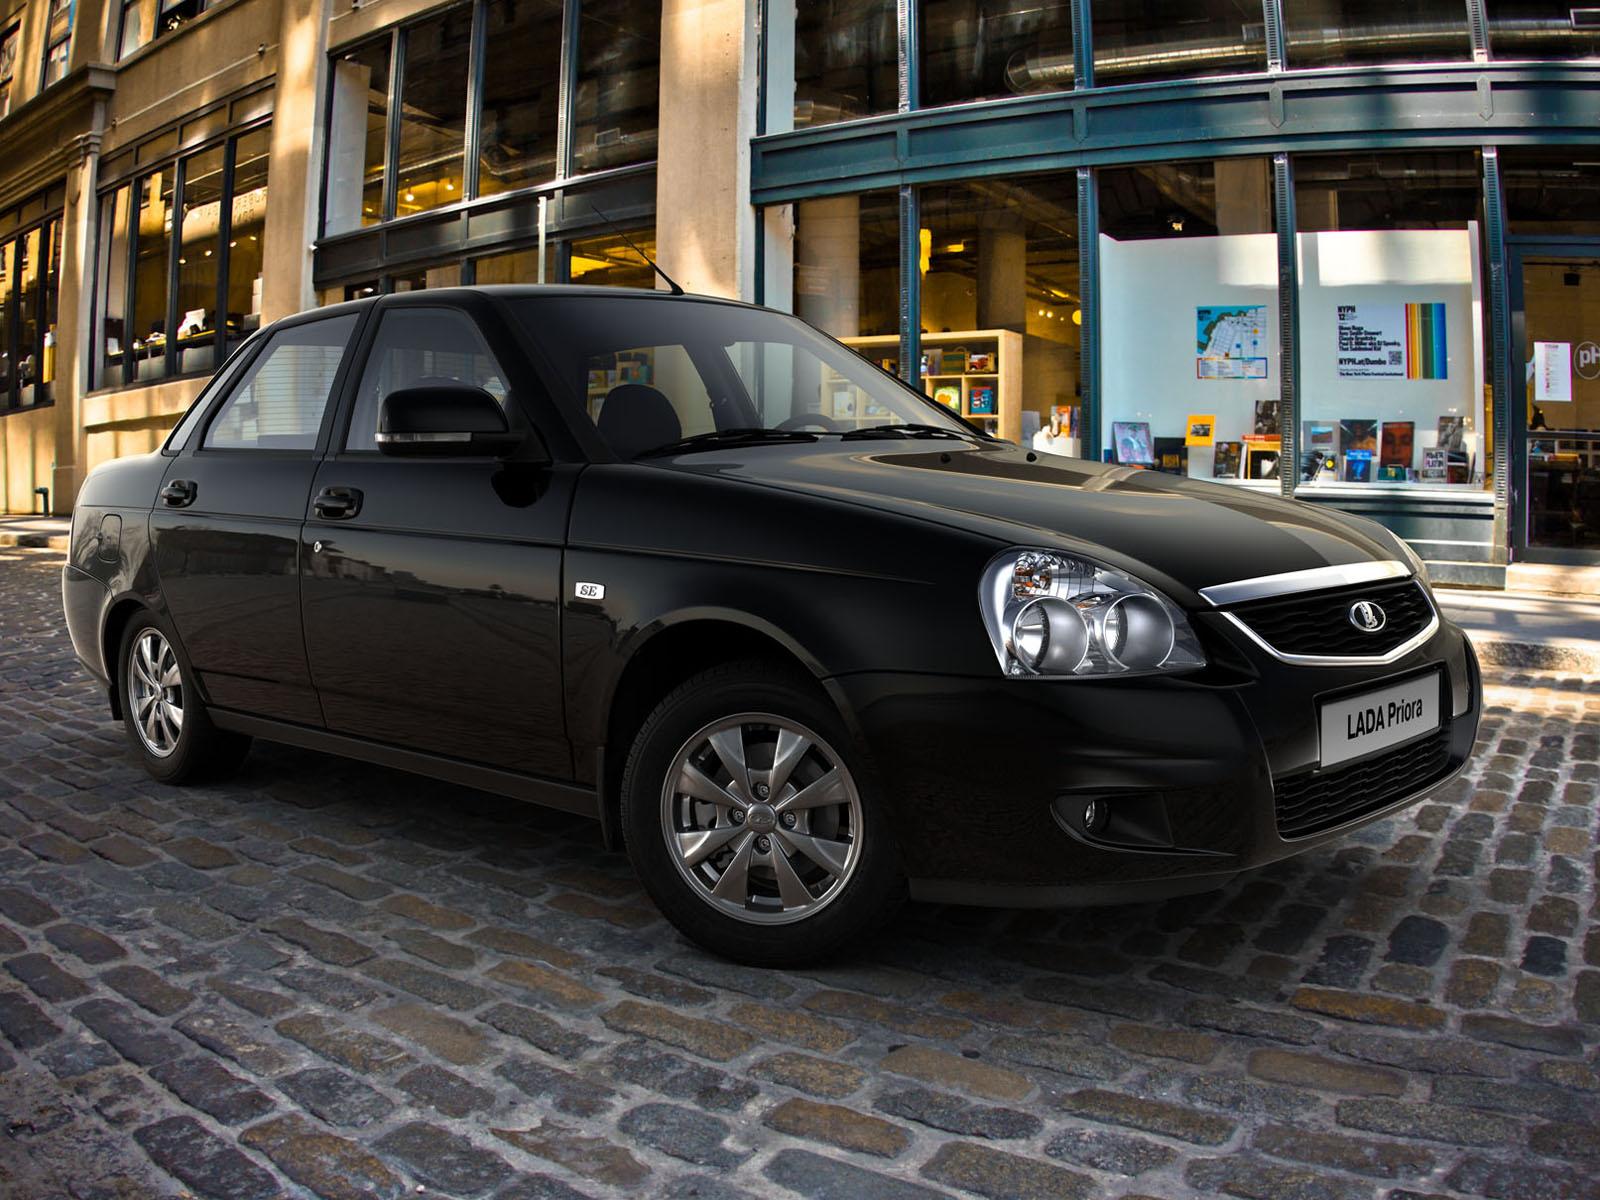 АвтоВАЗ разработал программу модернизации Lada Priora